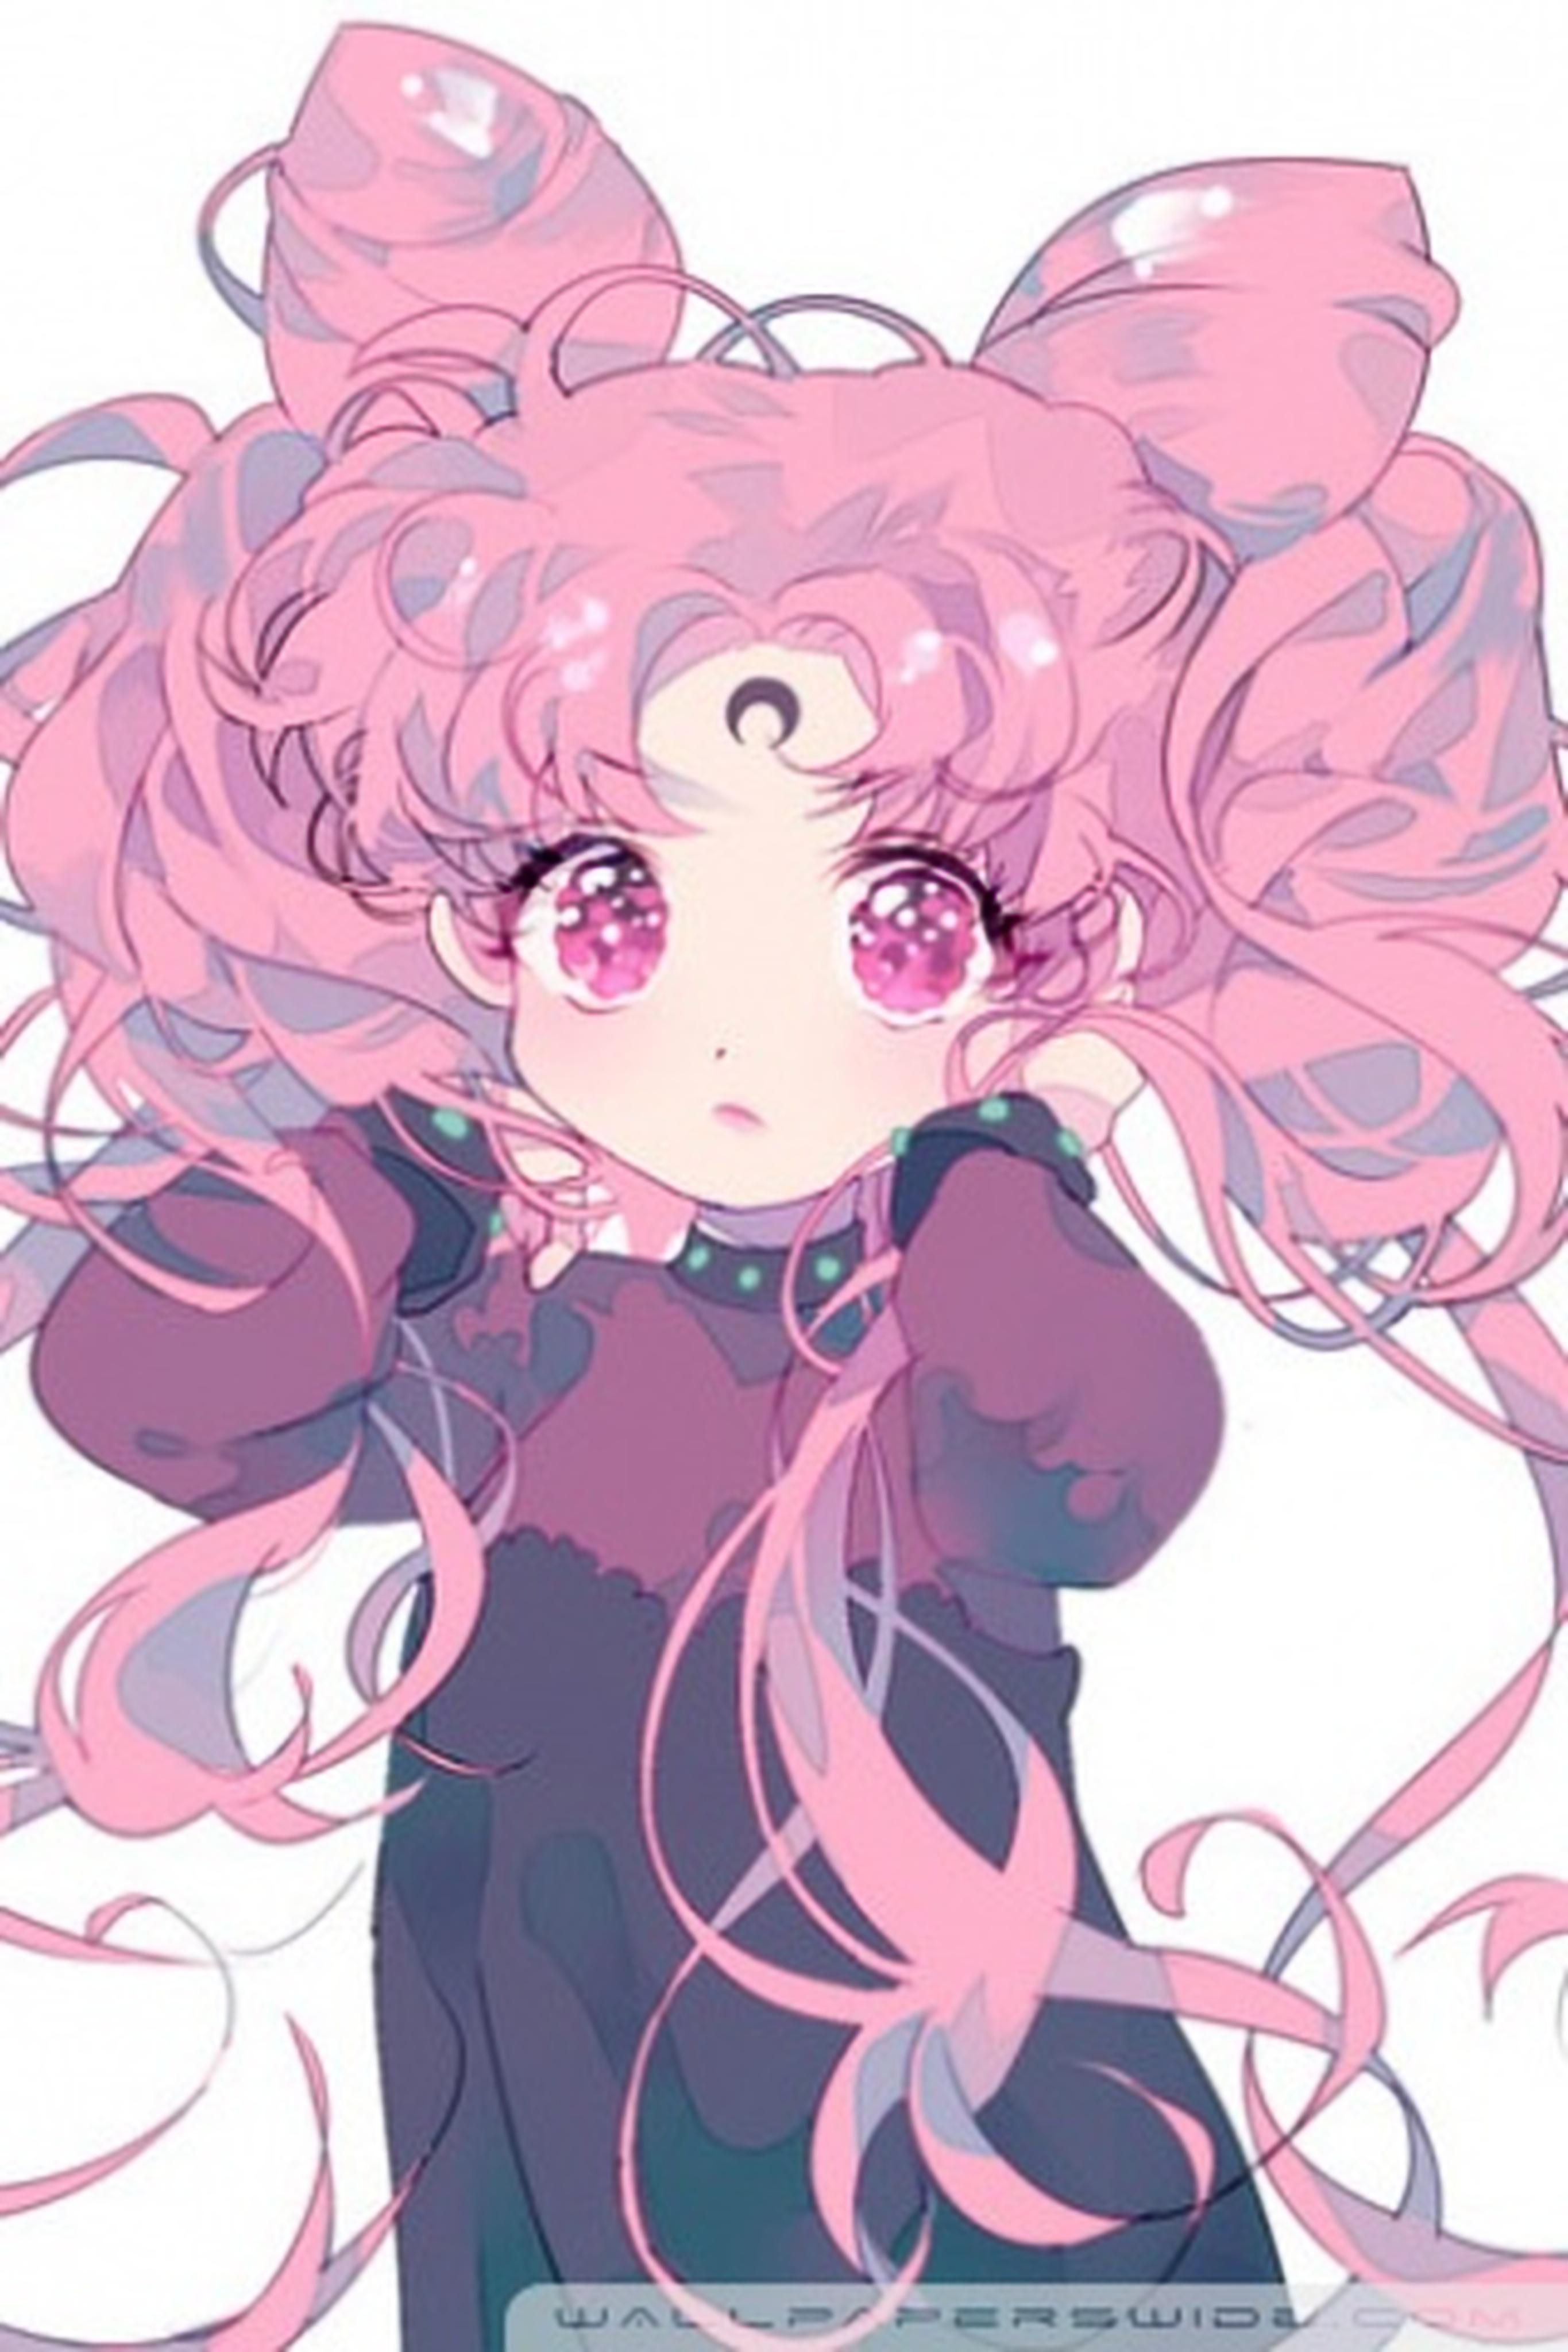 Fond D Ecran Noir Dessin Anime Fantaisie Fille